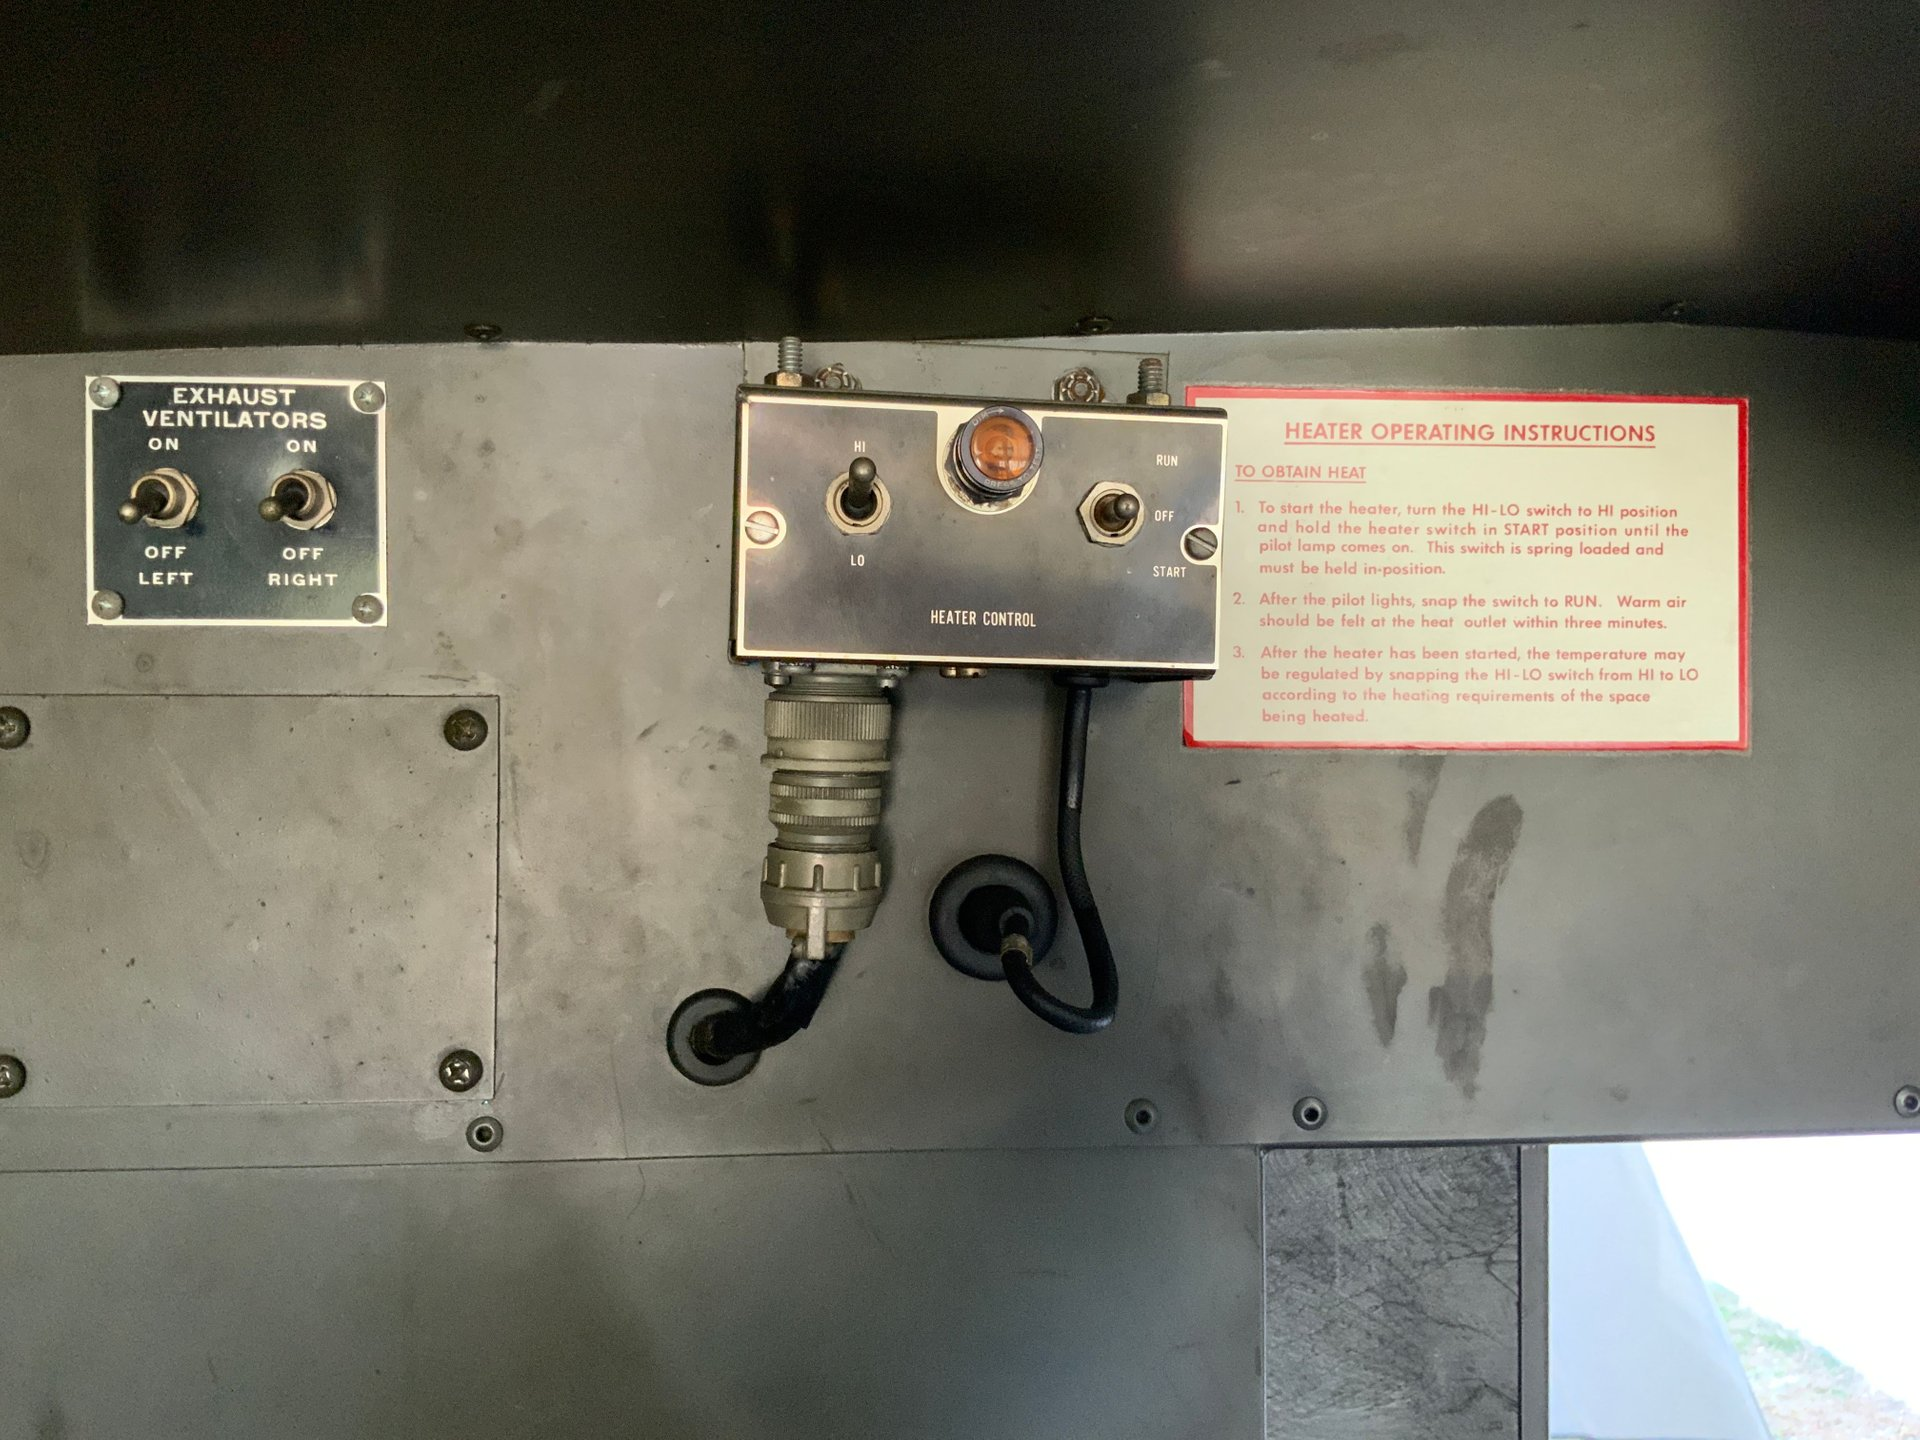 1967 Jeep M725 Ambulance Heater and Ventilator Controls